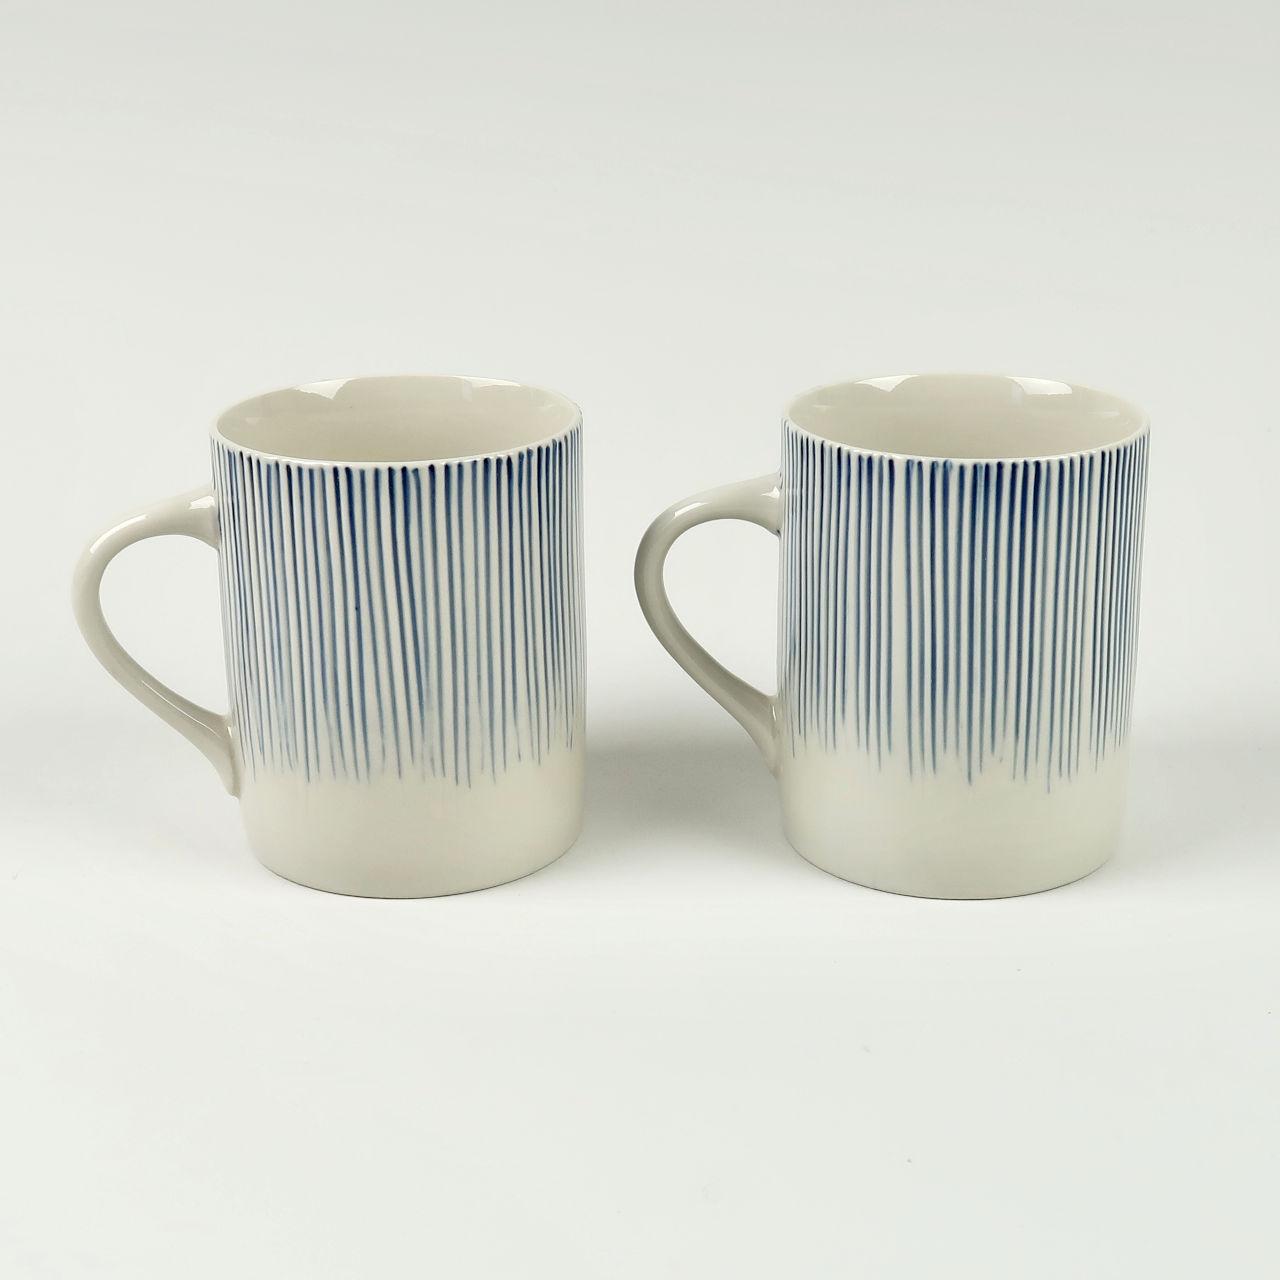 Pair of Tall Karuma Mugs - Blue